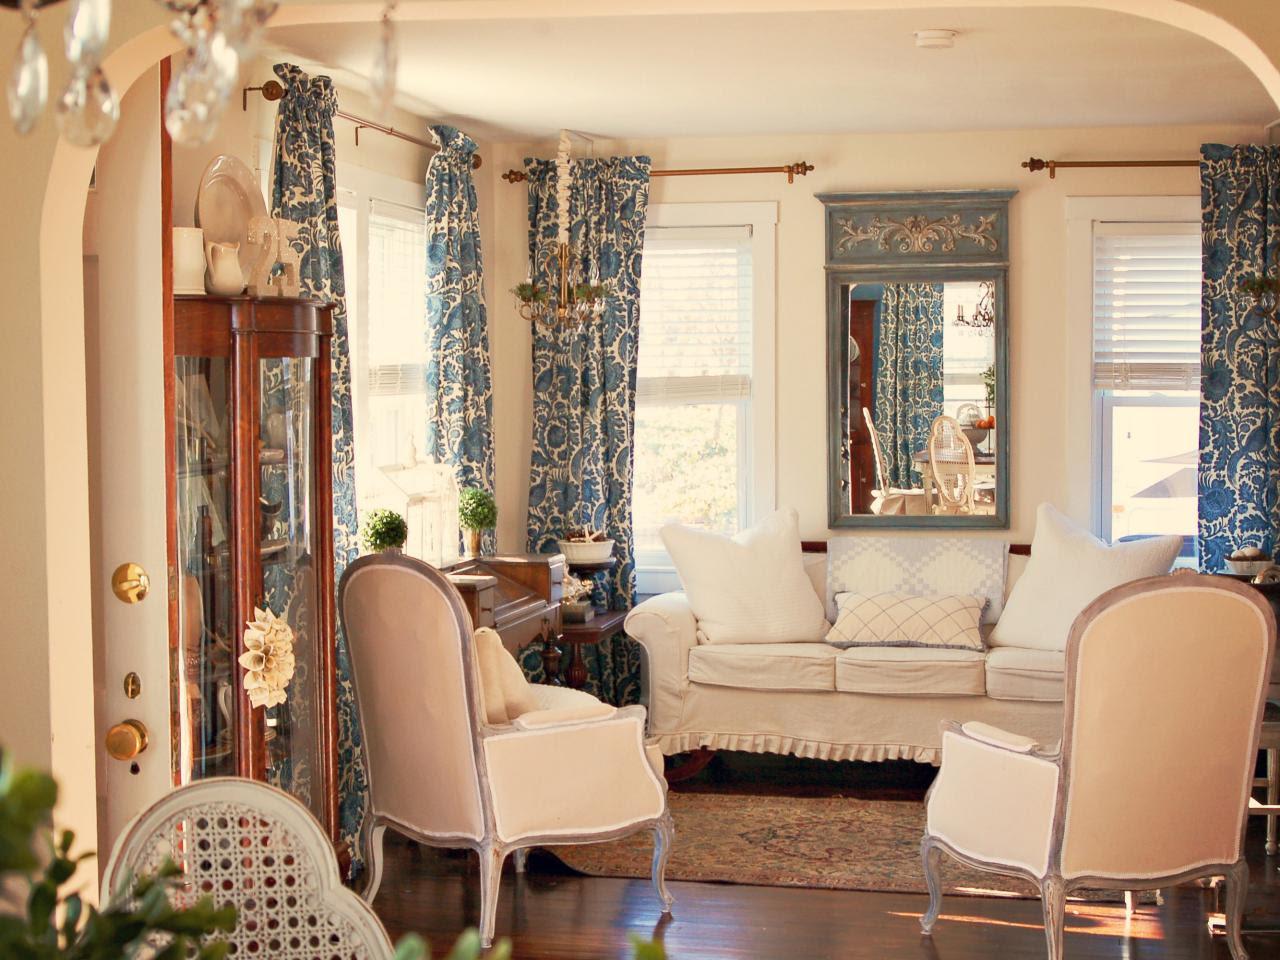 French-inspired design from HGTV | Interior Design Styles ...